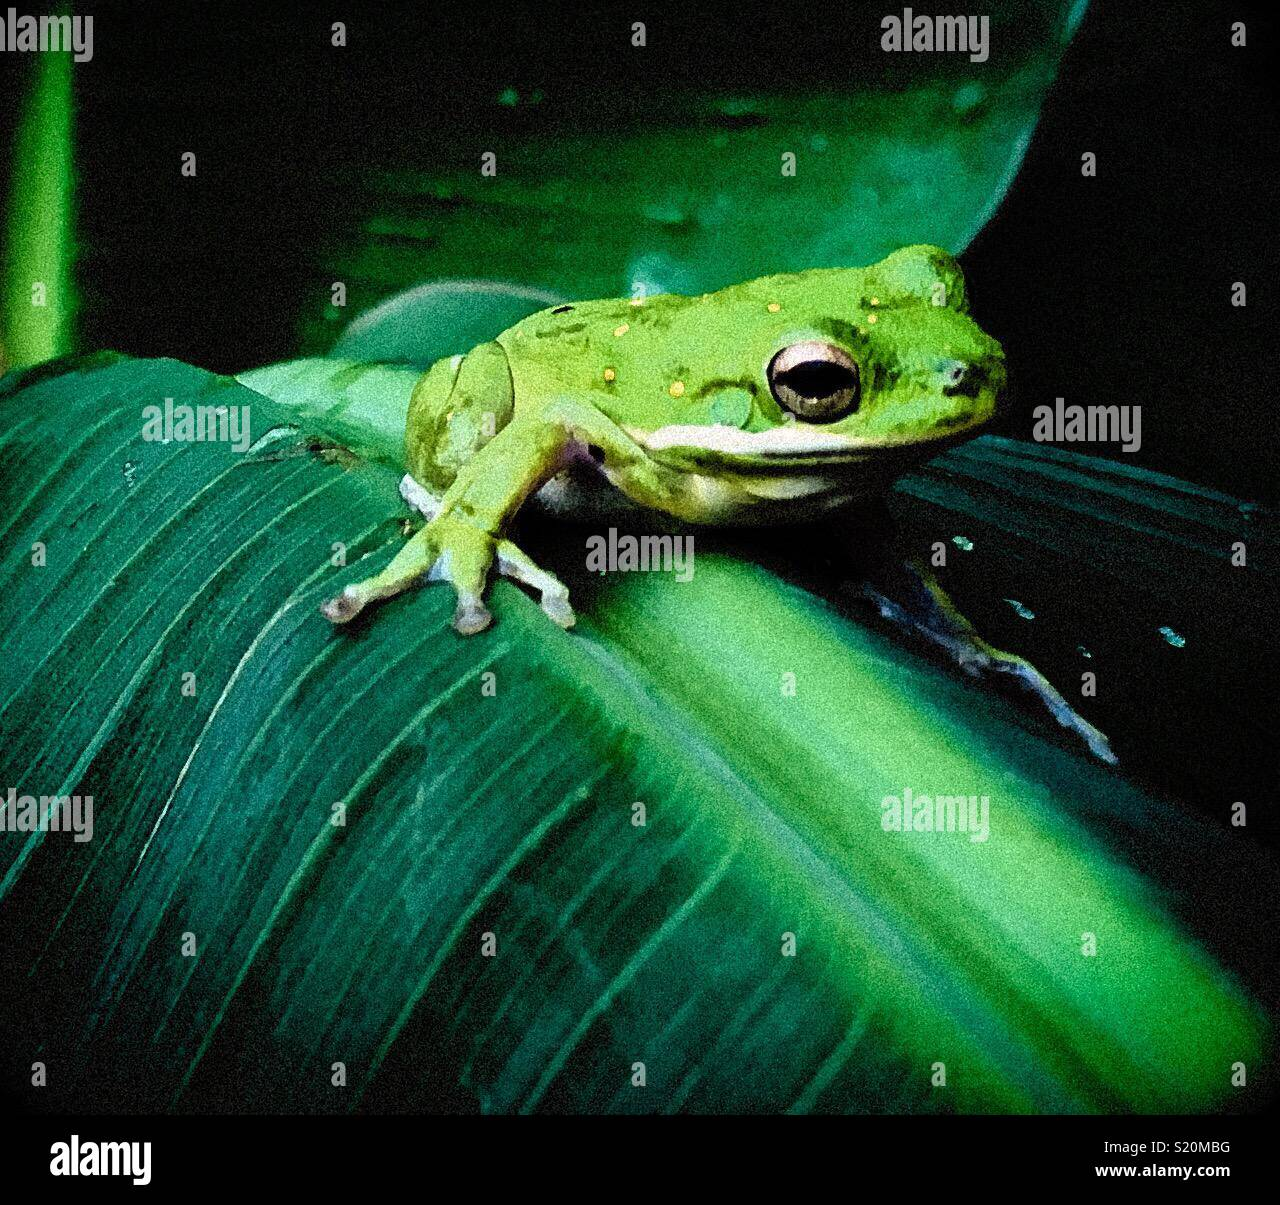 Green tree frog - Stock Image